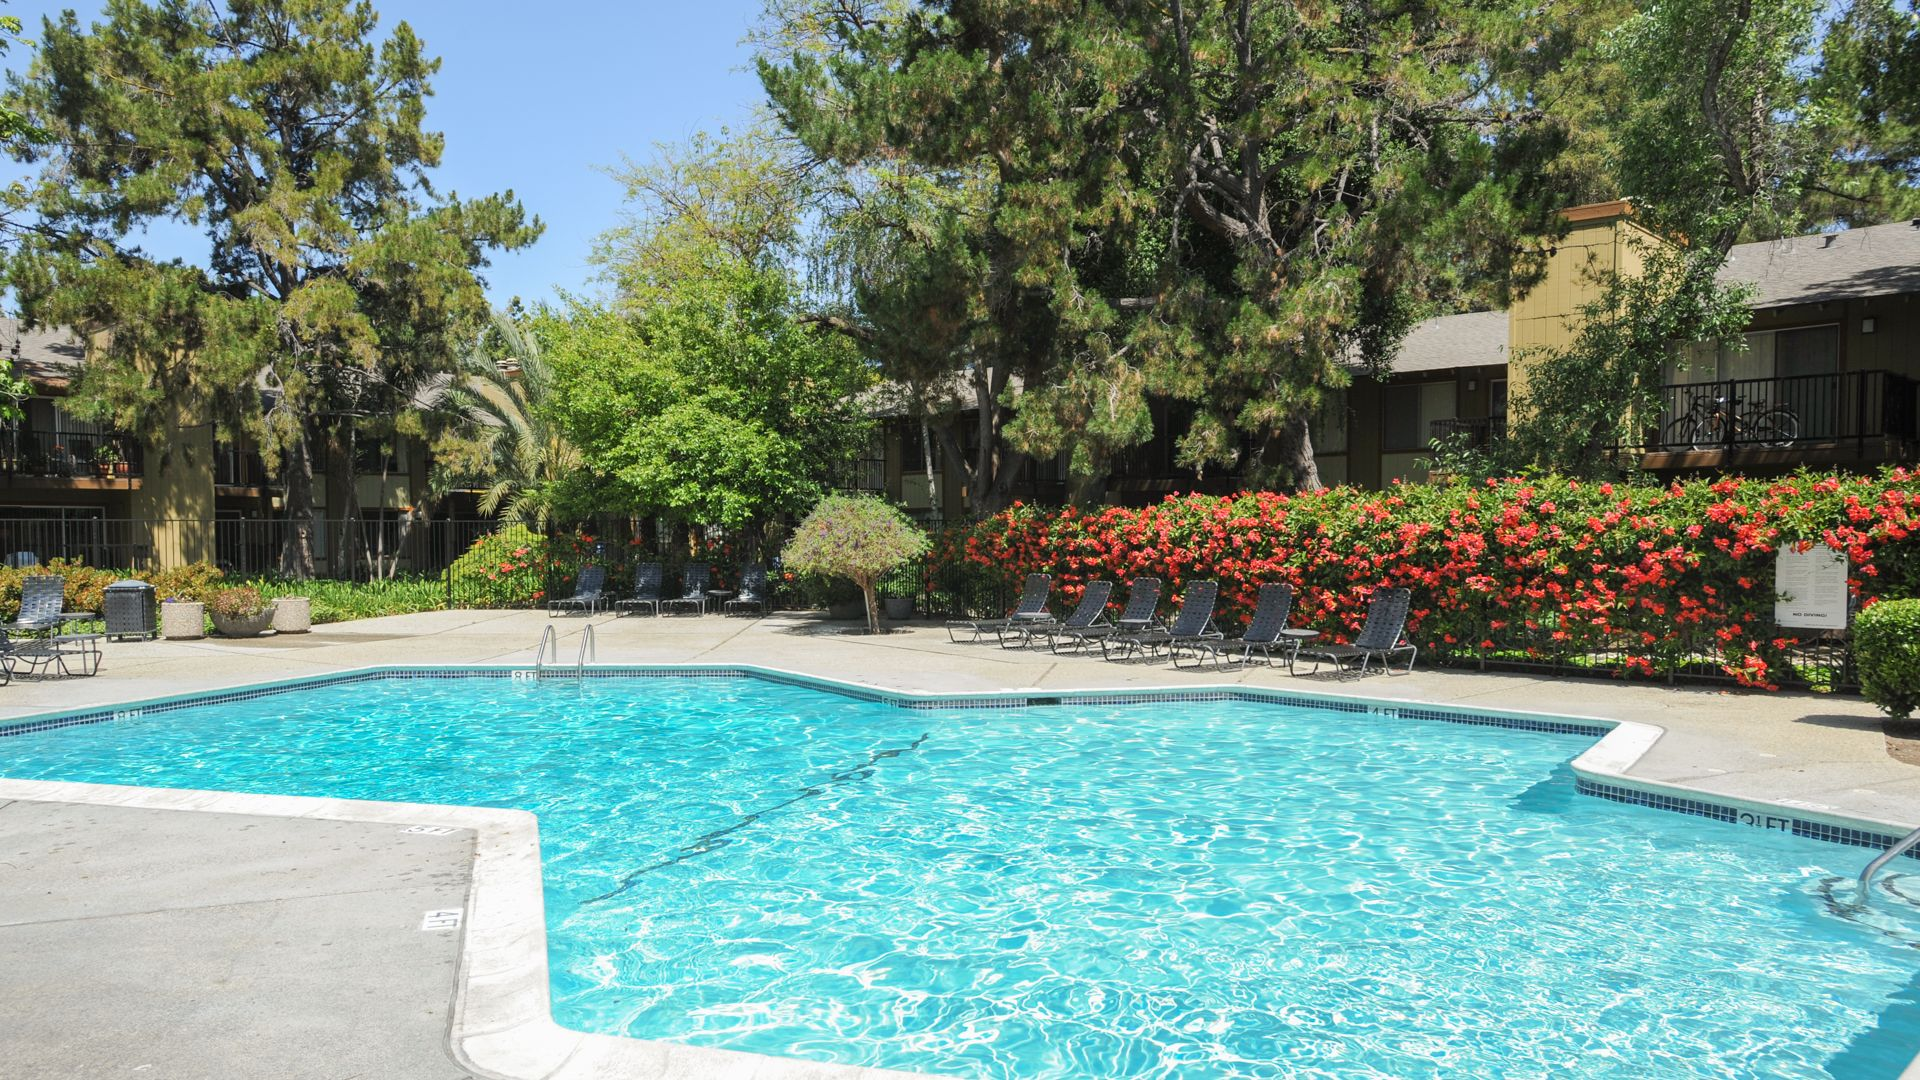 Laguna Clara Apartments - Pool